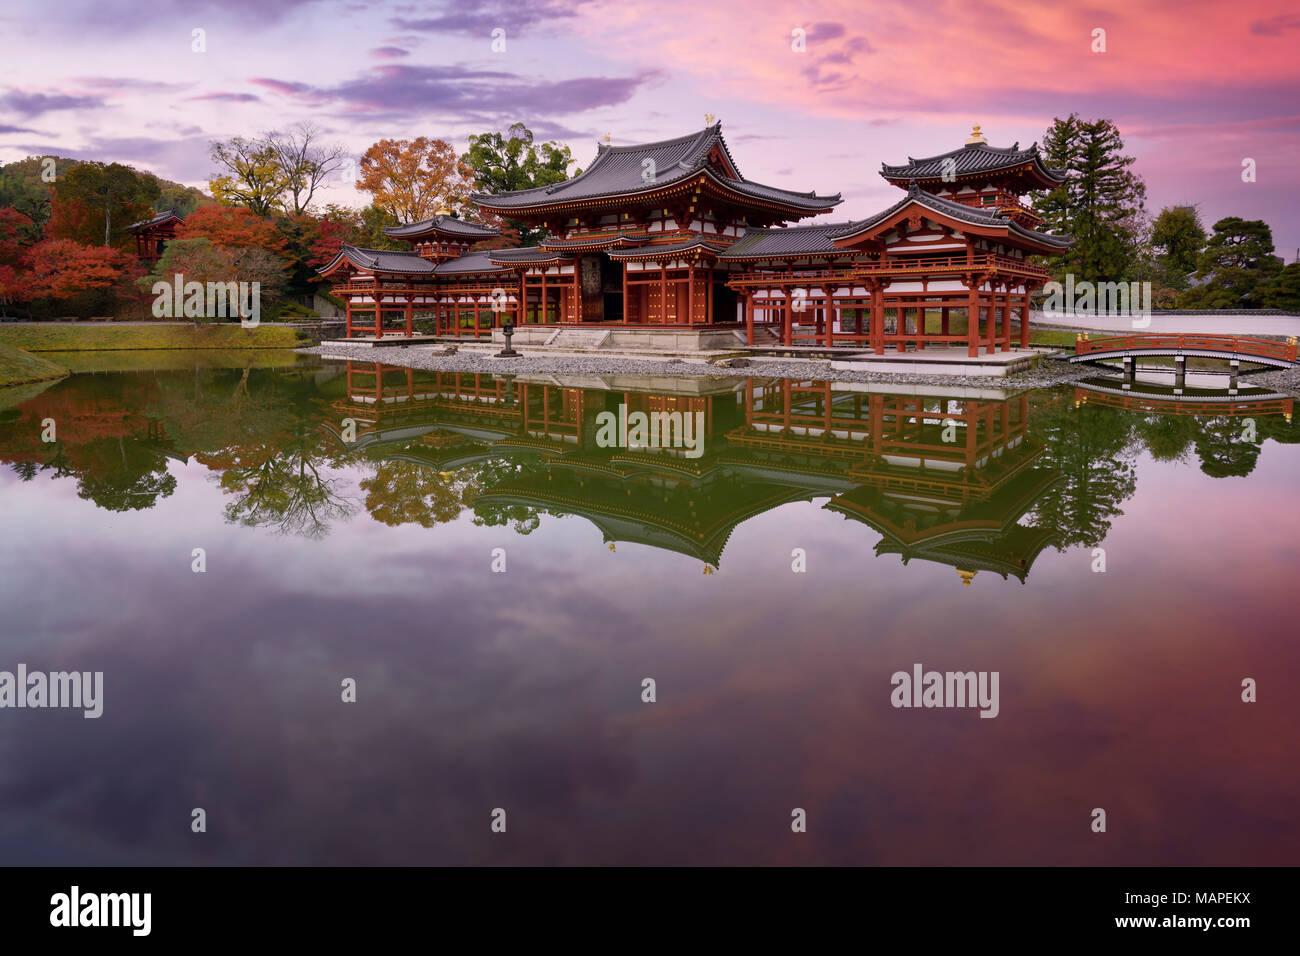 Peaceful autumn scenery of the Phoenix Hall, Amida hall of Byodoin temple on Kojima island of Jodoshiki teien, Pure Land garden pond. Uji, Kyoto Prefe - Stock Image